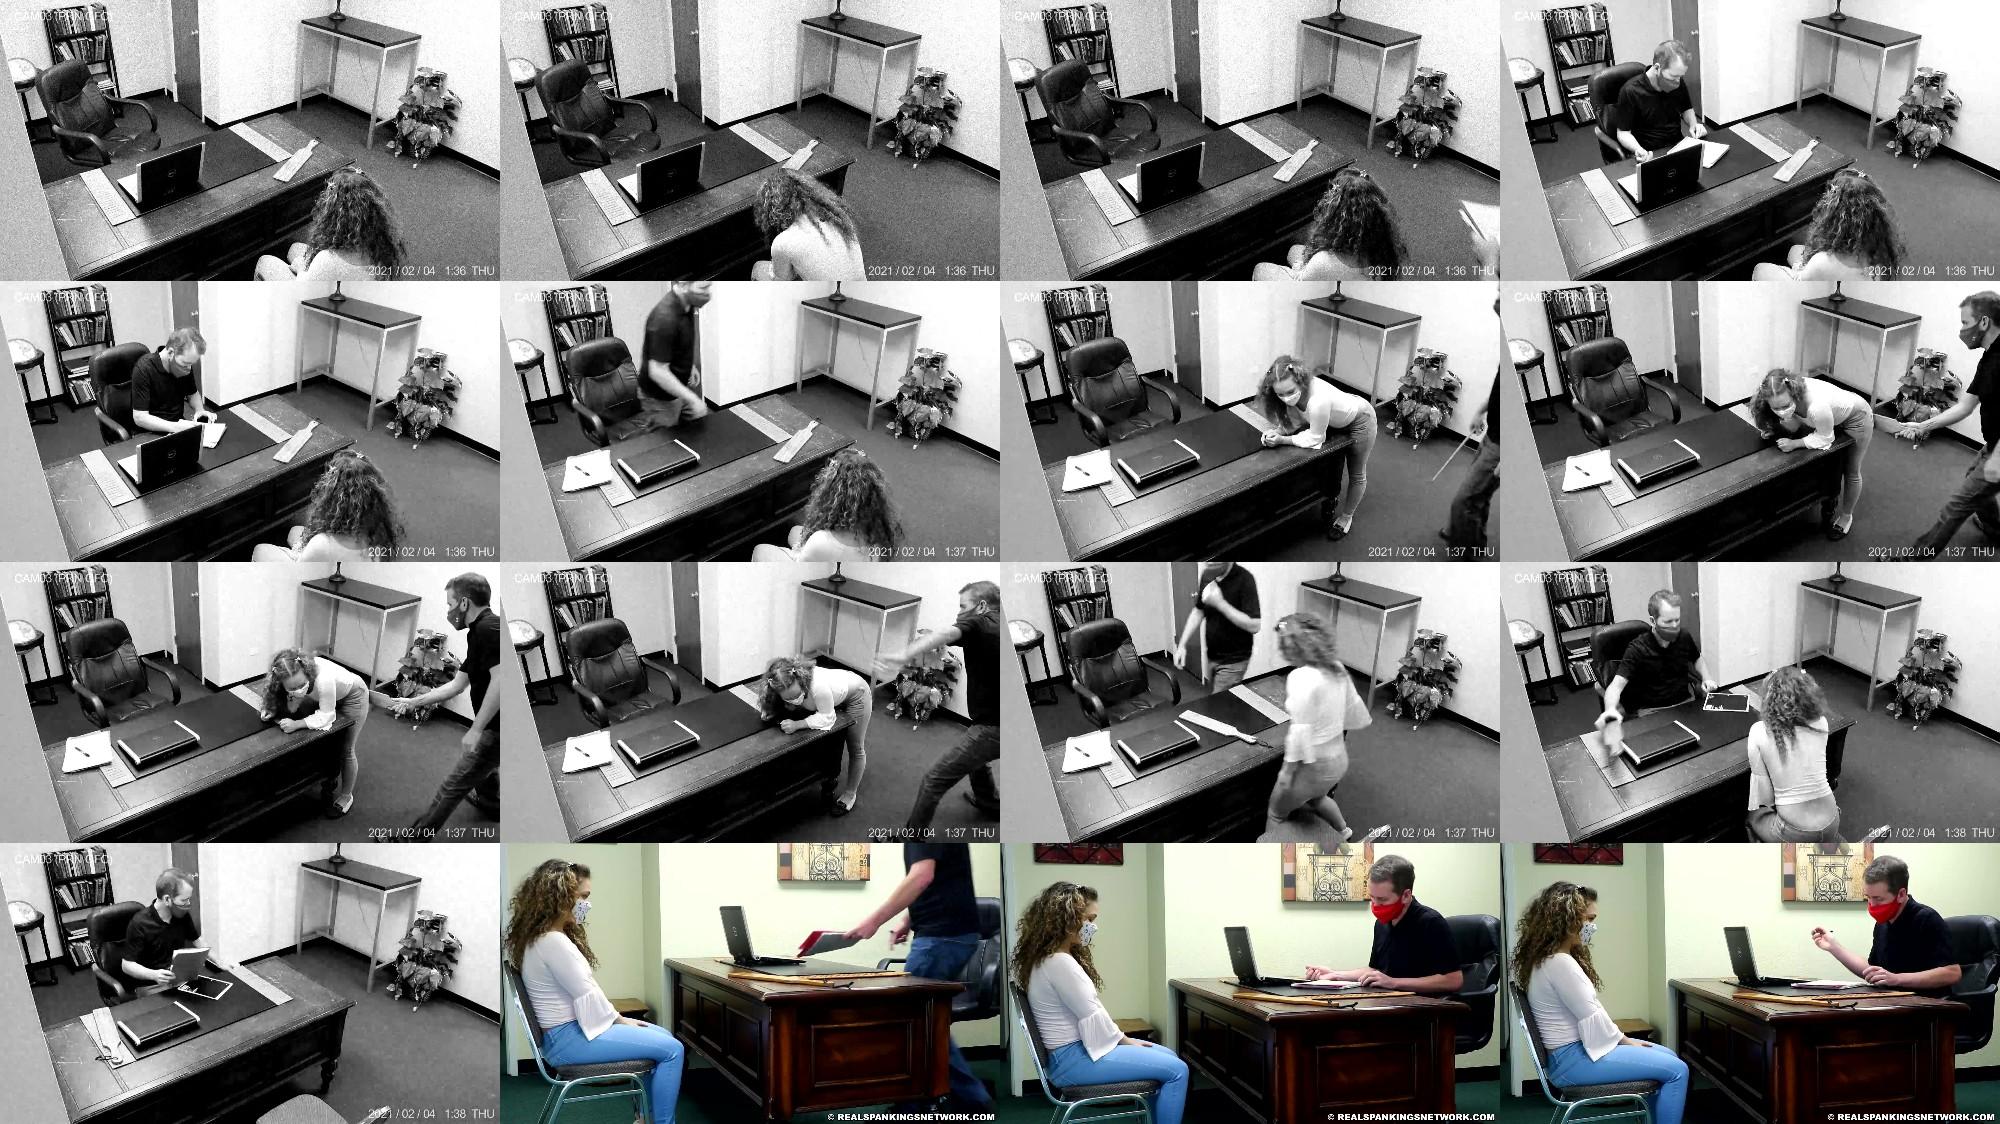 Kiki Cali   Spanked At School Spanked At Home part 1 Of 2 - Real Spankings – MP4/Full HD – Kiki Cali - Spanked At School, Spanked At Home (part 1 Of 2)